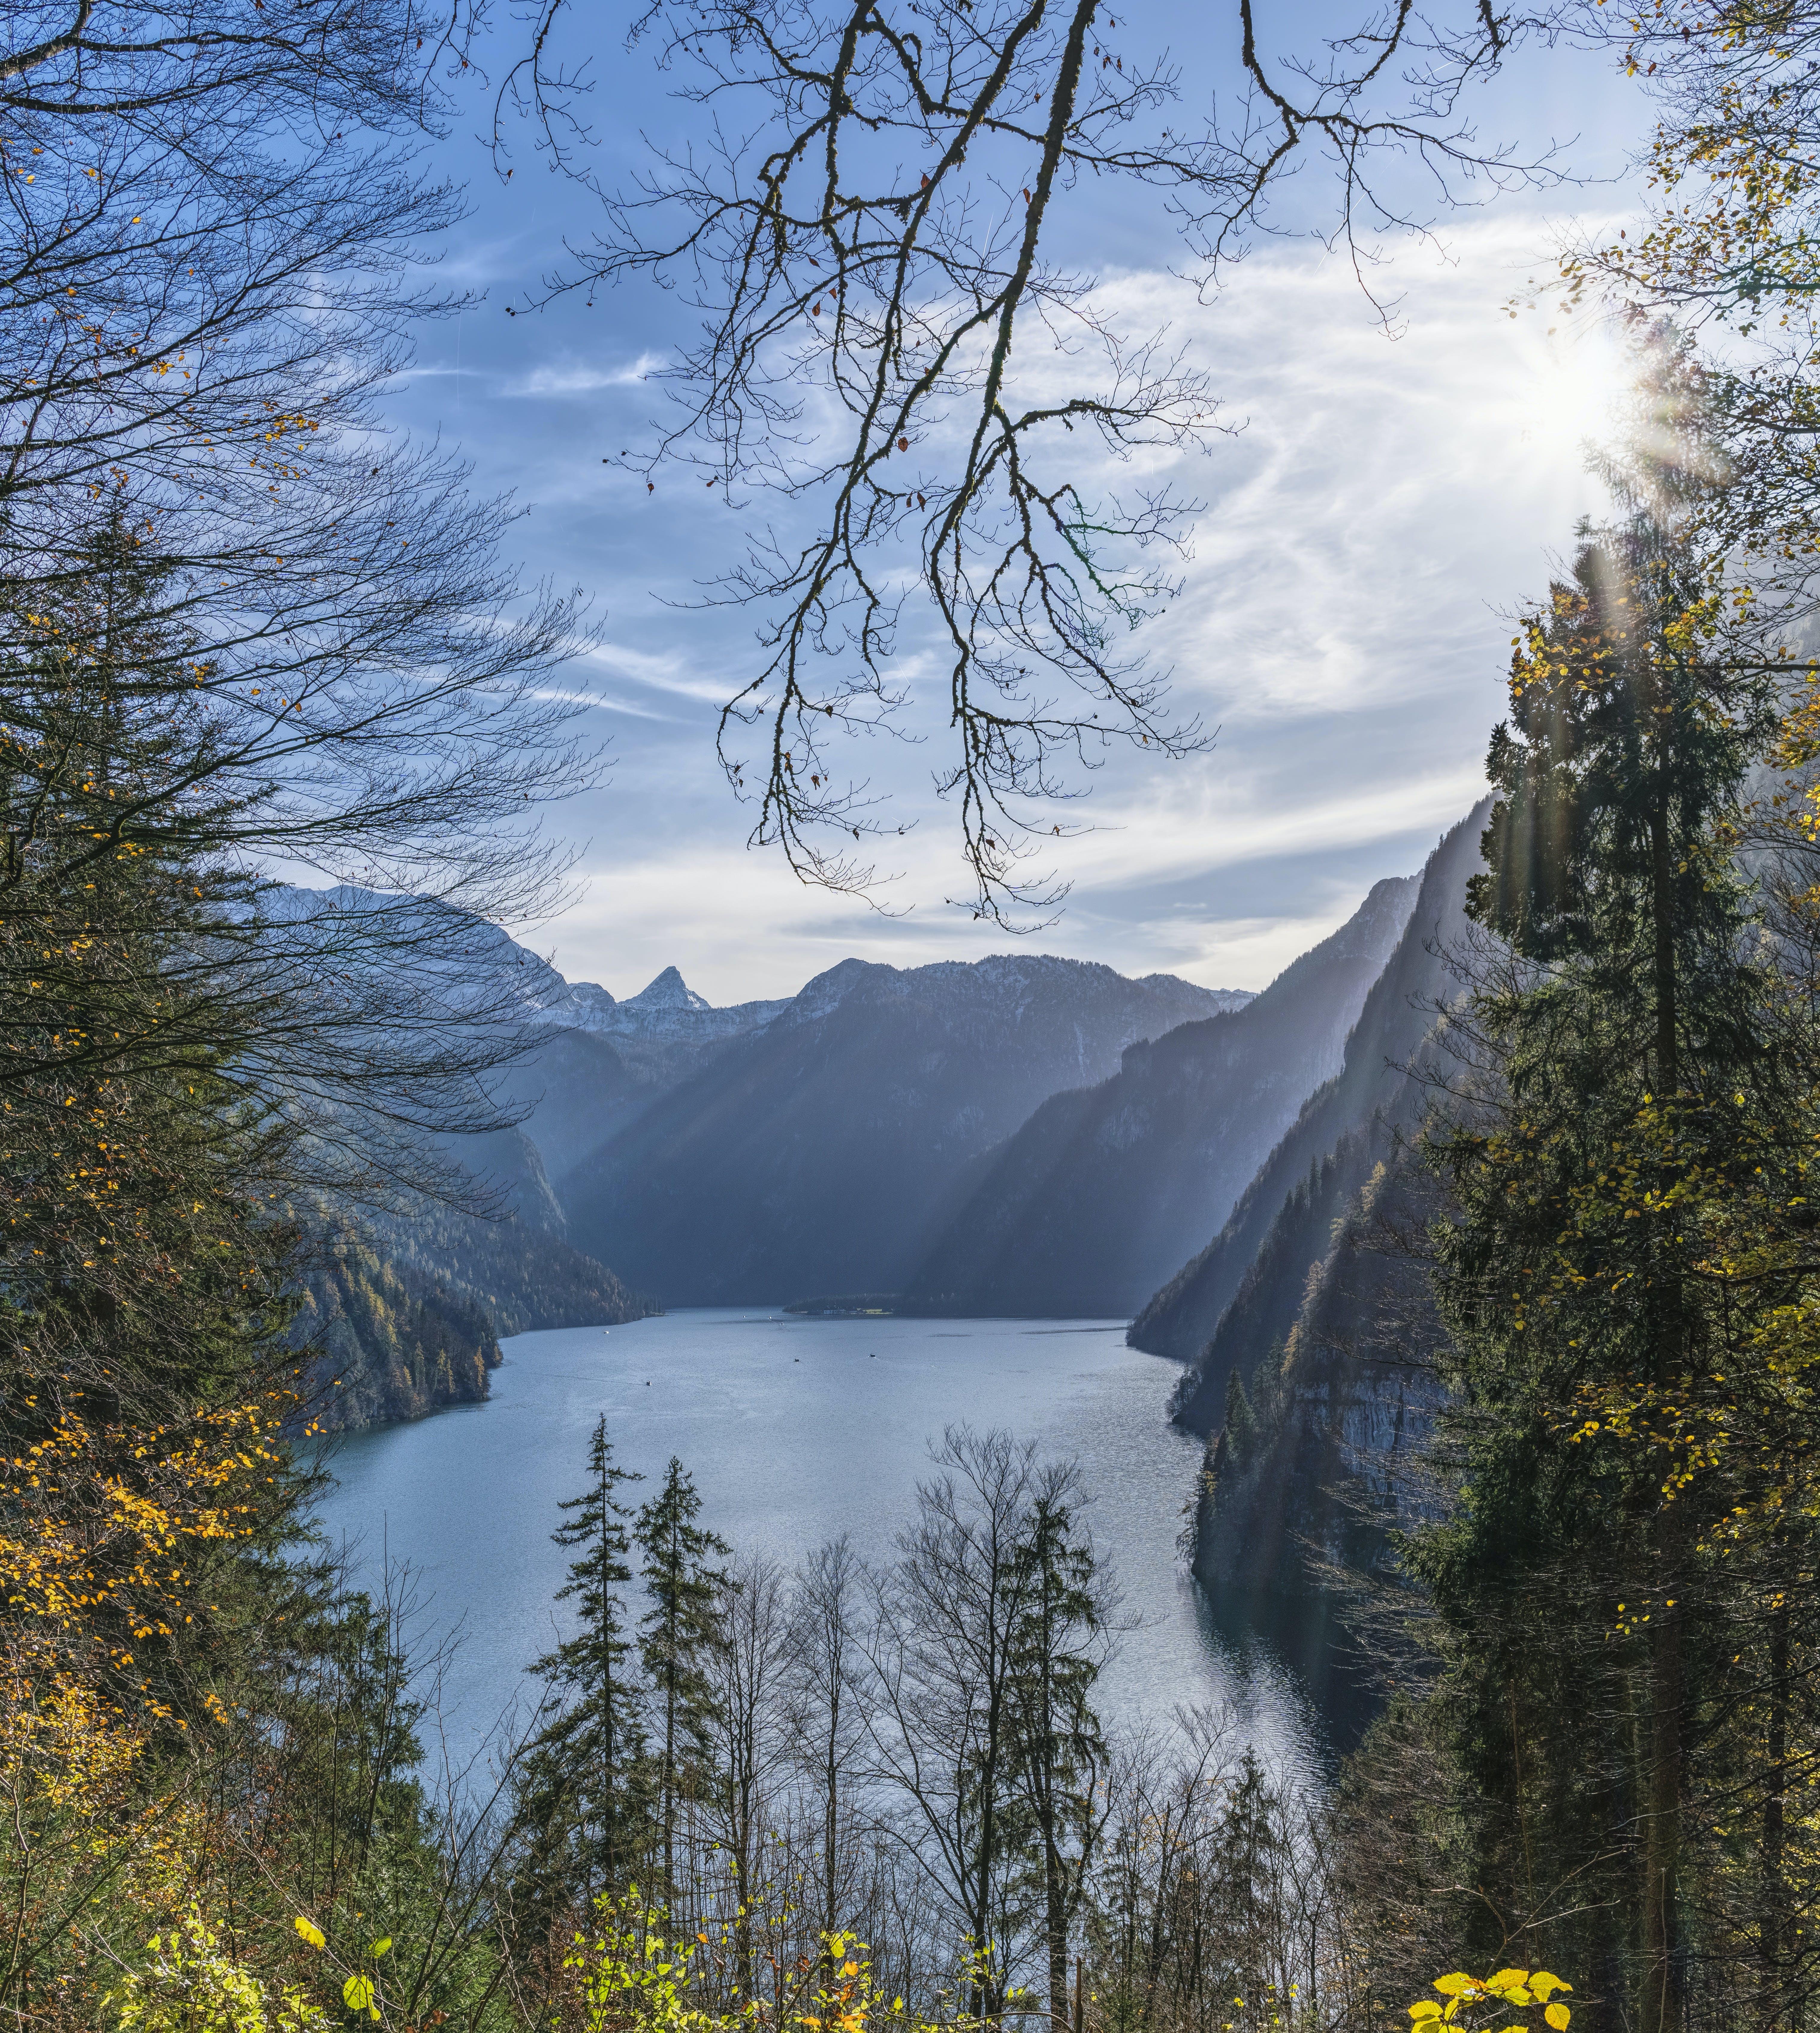 Kostenloses Stock Foto zu bäume, berge, gebirge, himmel